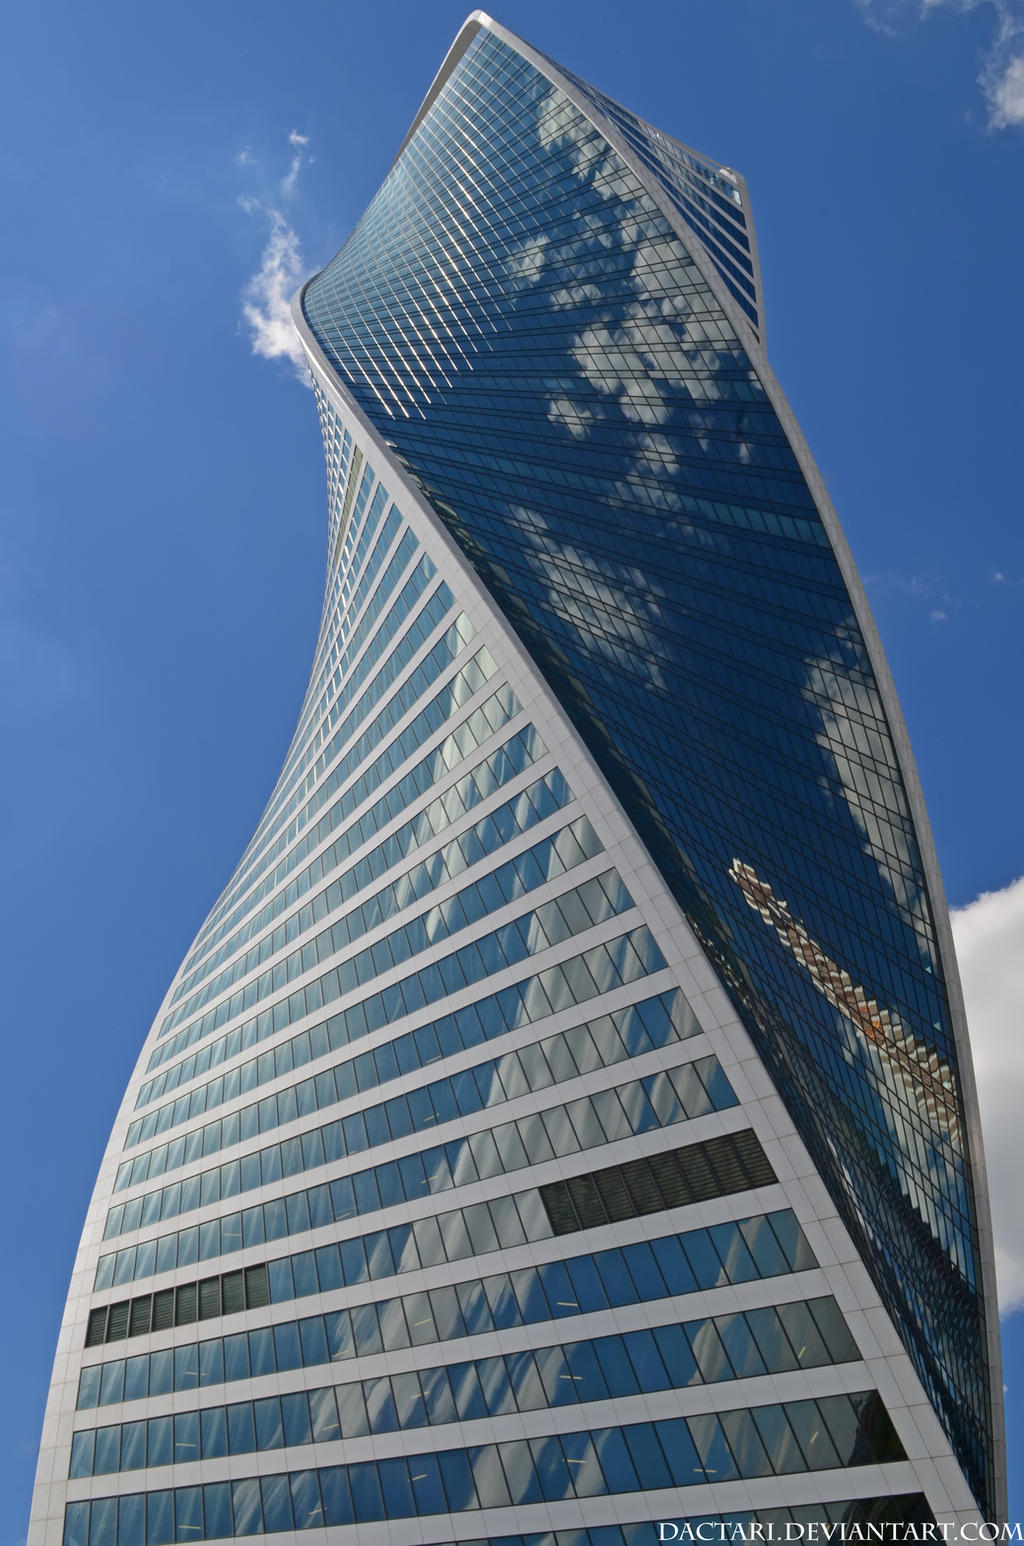 Evolution tower by Dactari